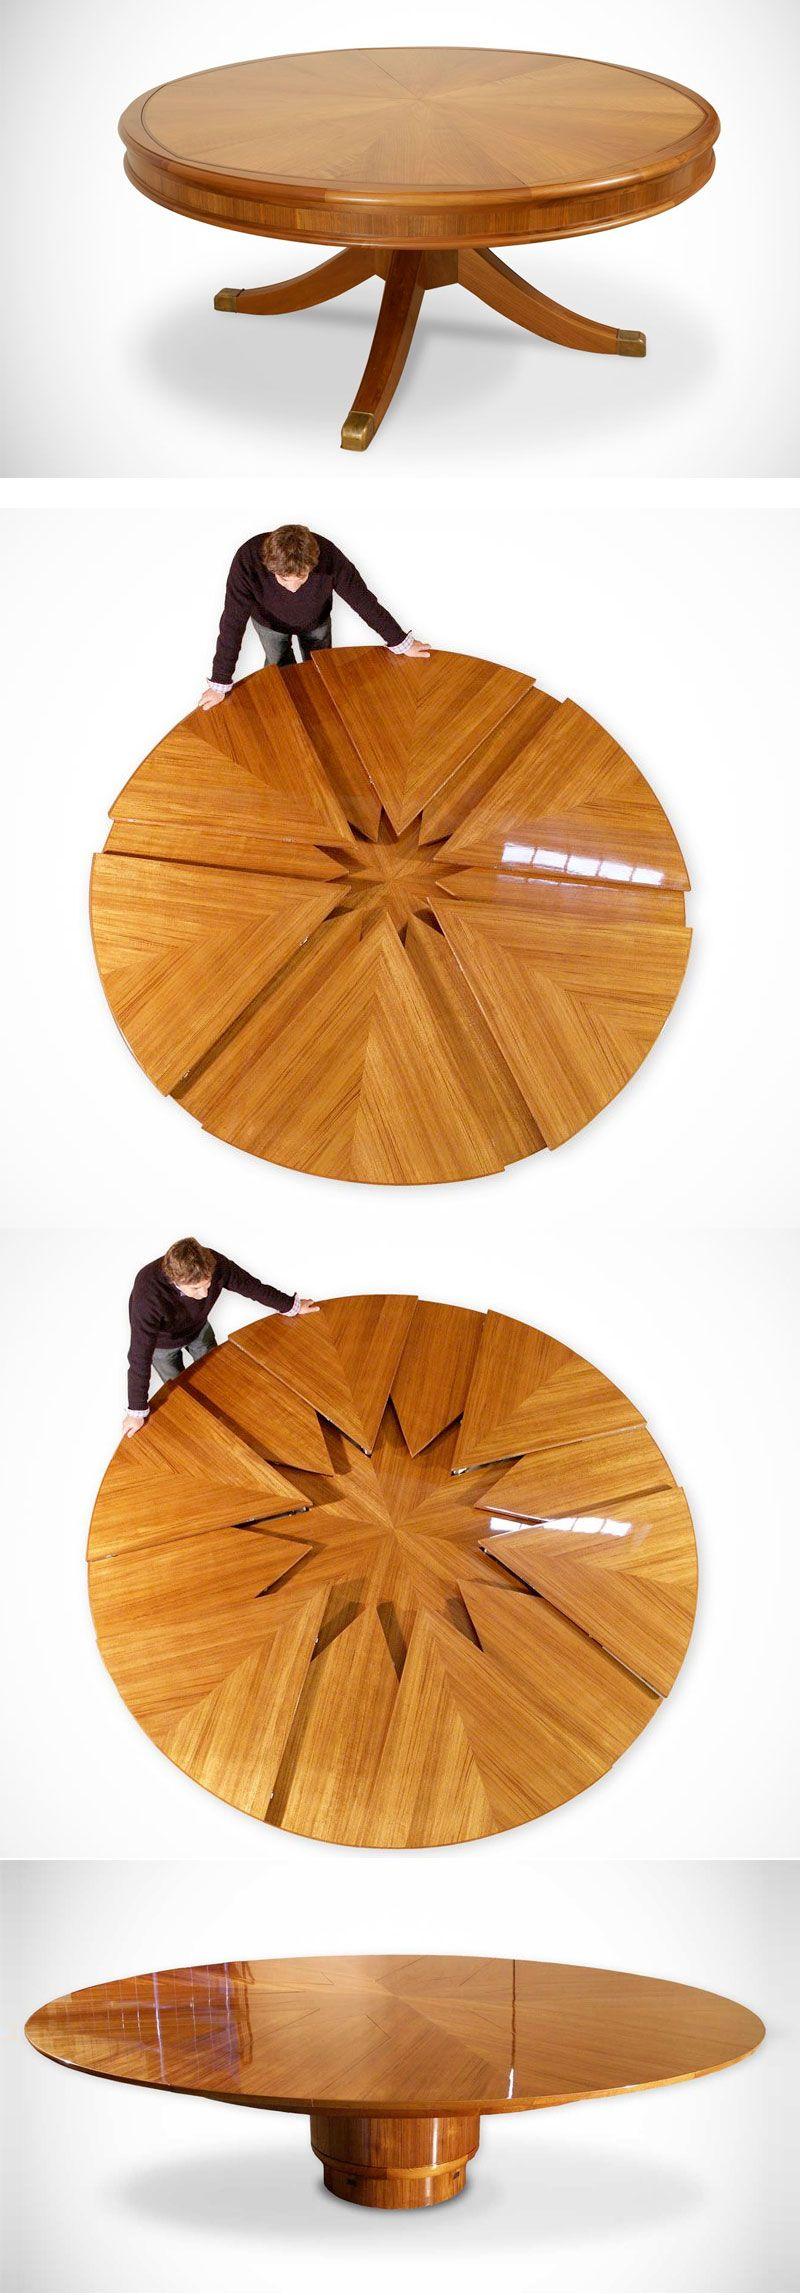 30 Extendable Dining Tables Extendable Dining Table Expandable